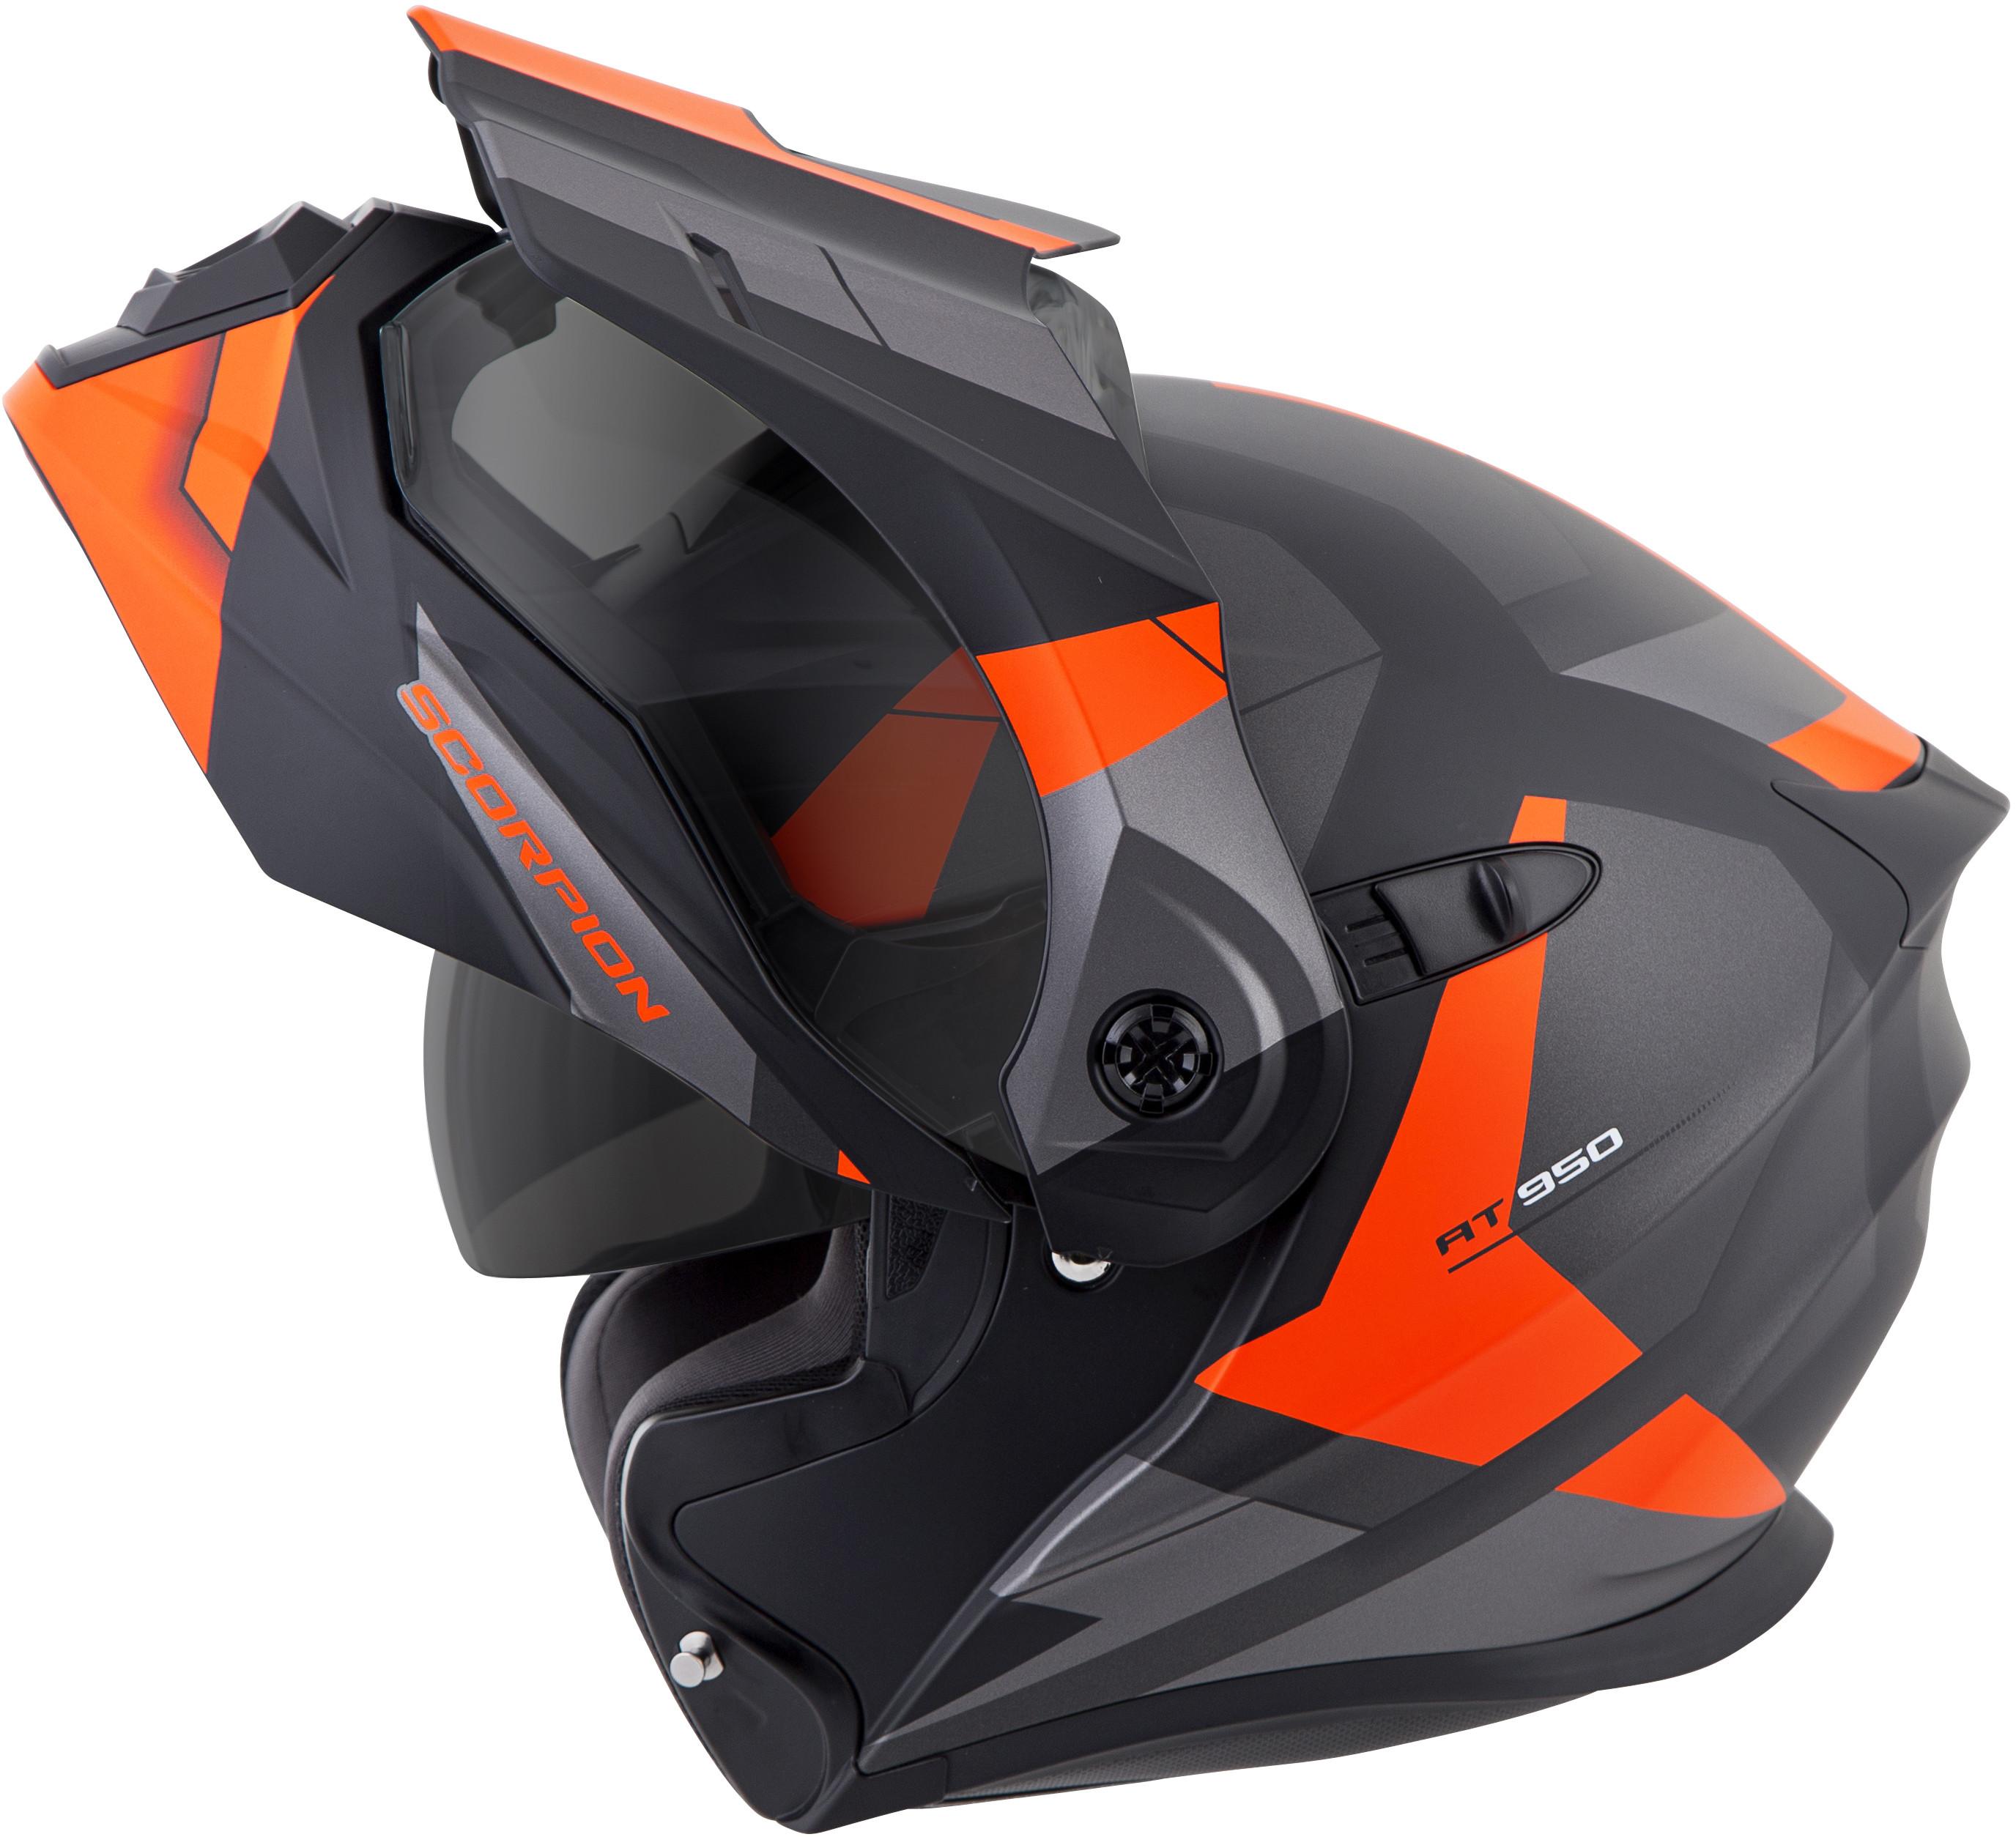 for-Scorpion-Helmet-EXO-AT950-Neocon-Snow-Helmet-with-Dual-Lens-Shield miniature 19